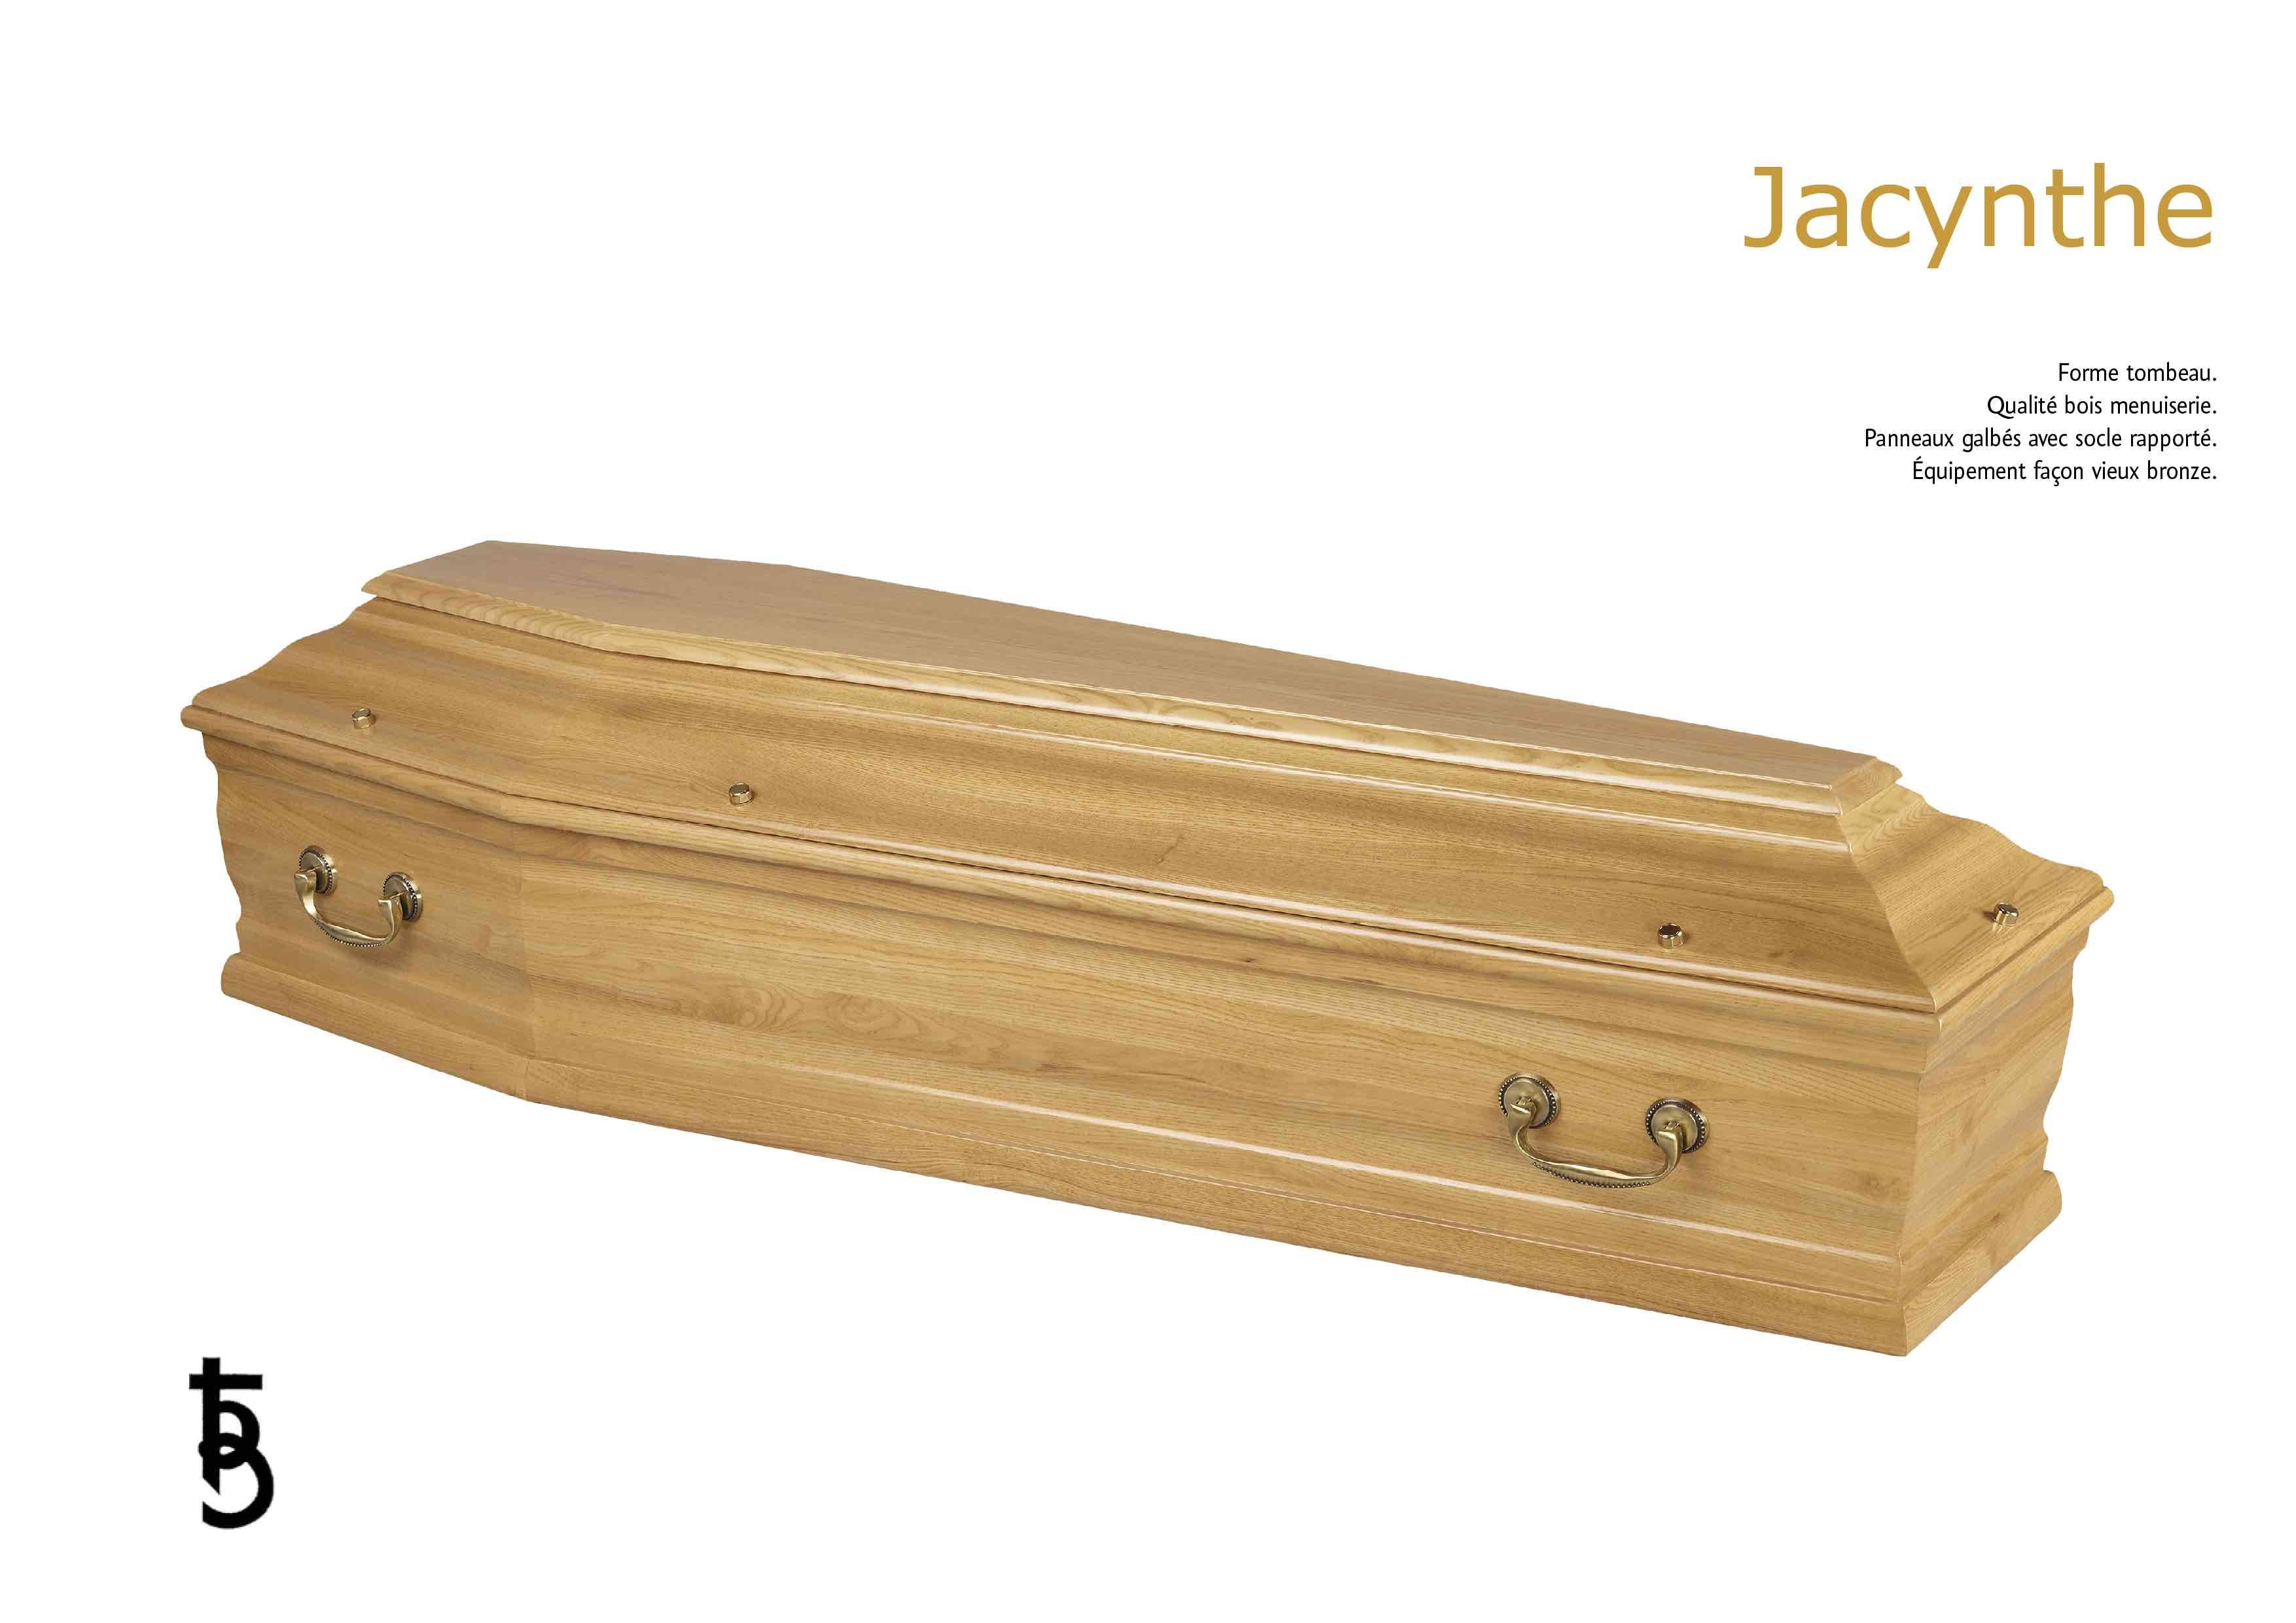 CERCUEIL JACYNTHE